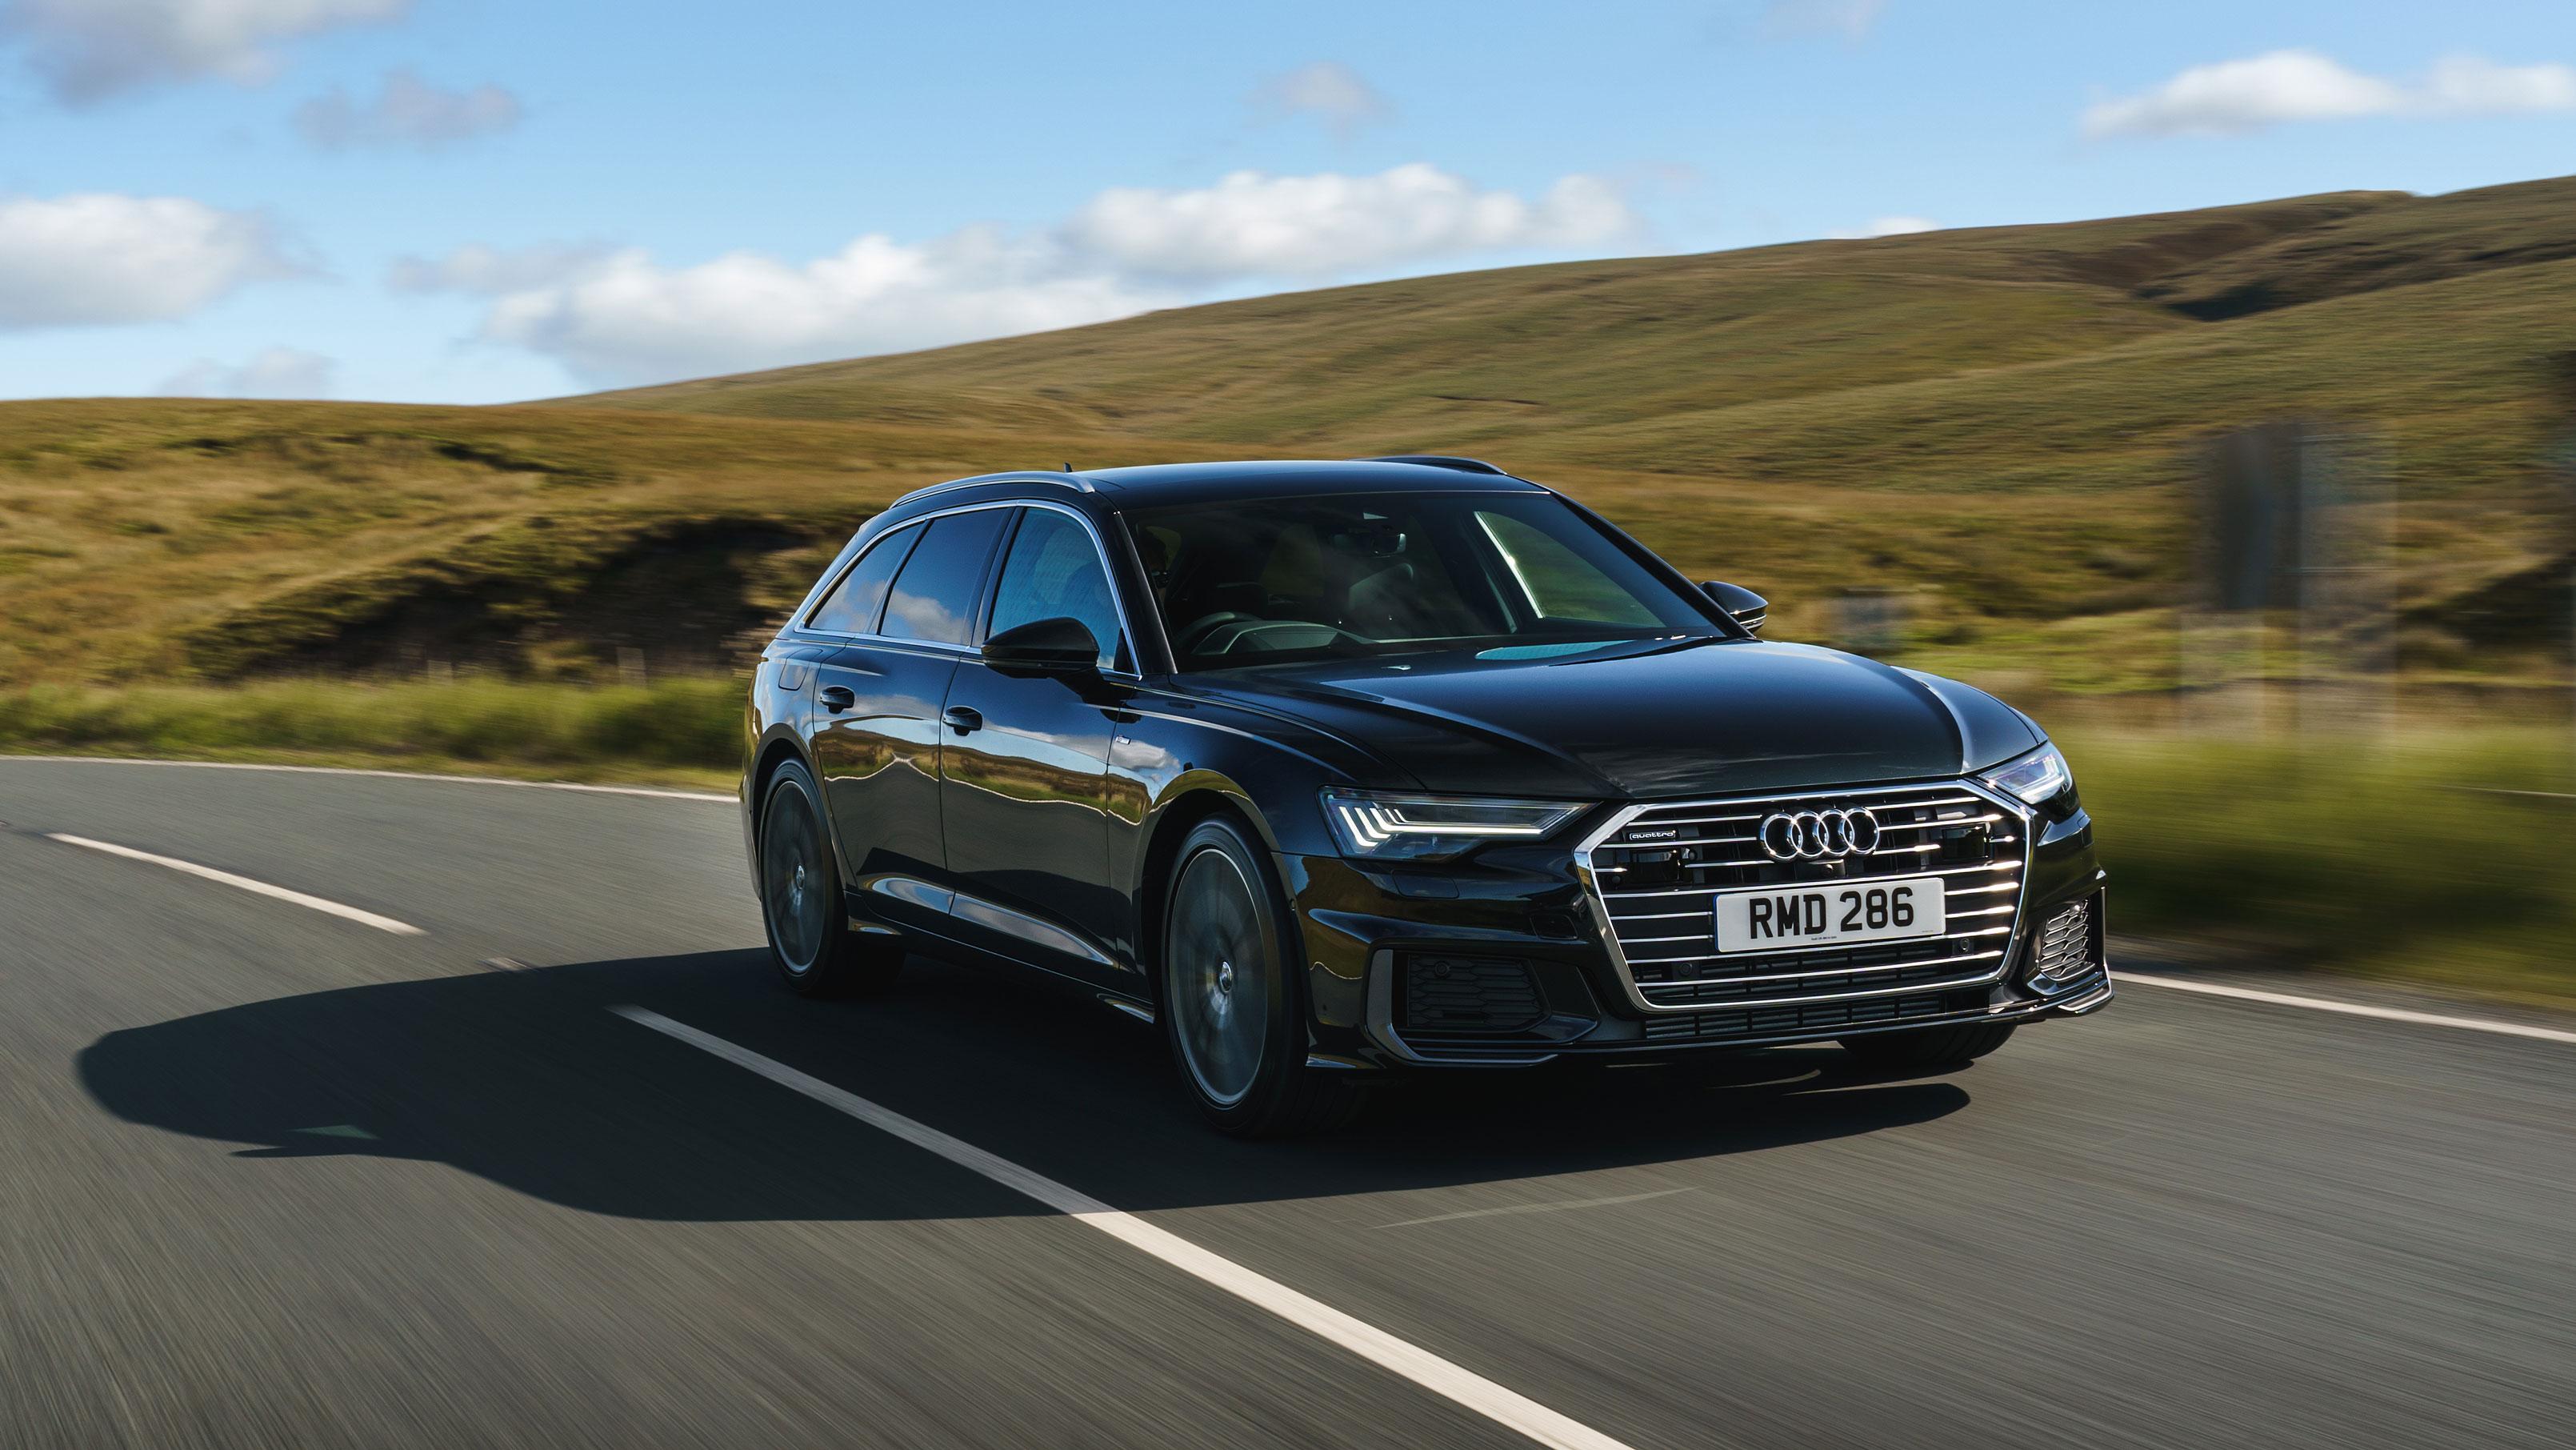 Kekurangan Audi A6 Allroad 2016 Tangguh